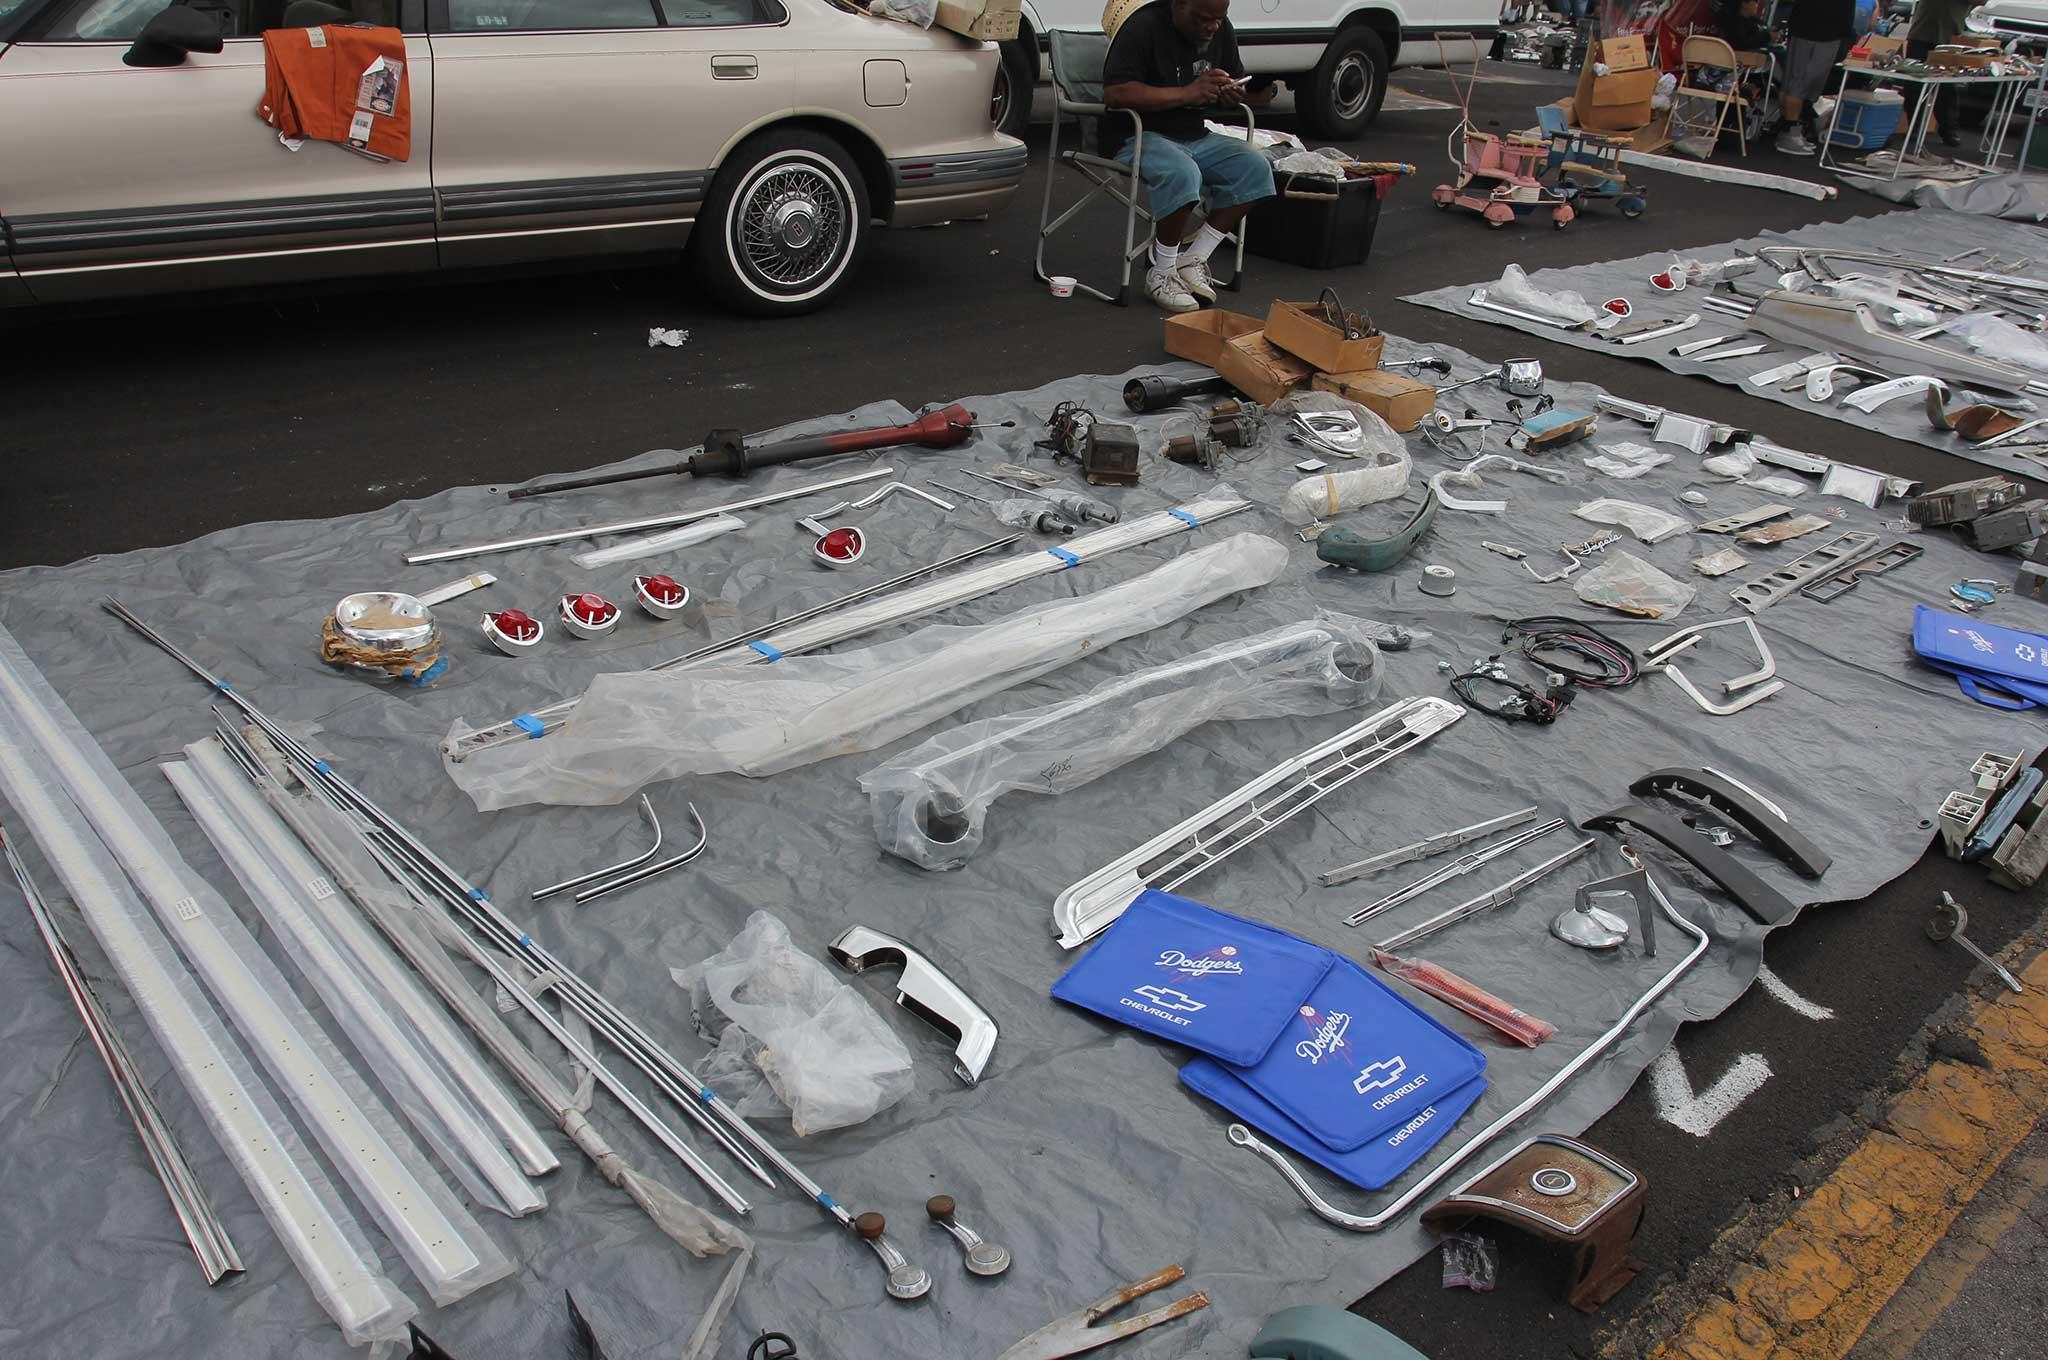 Pomona Swap Meet And Classic Car Show Trim Accessories 019 Lowrider